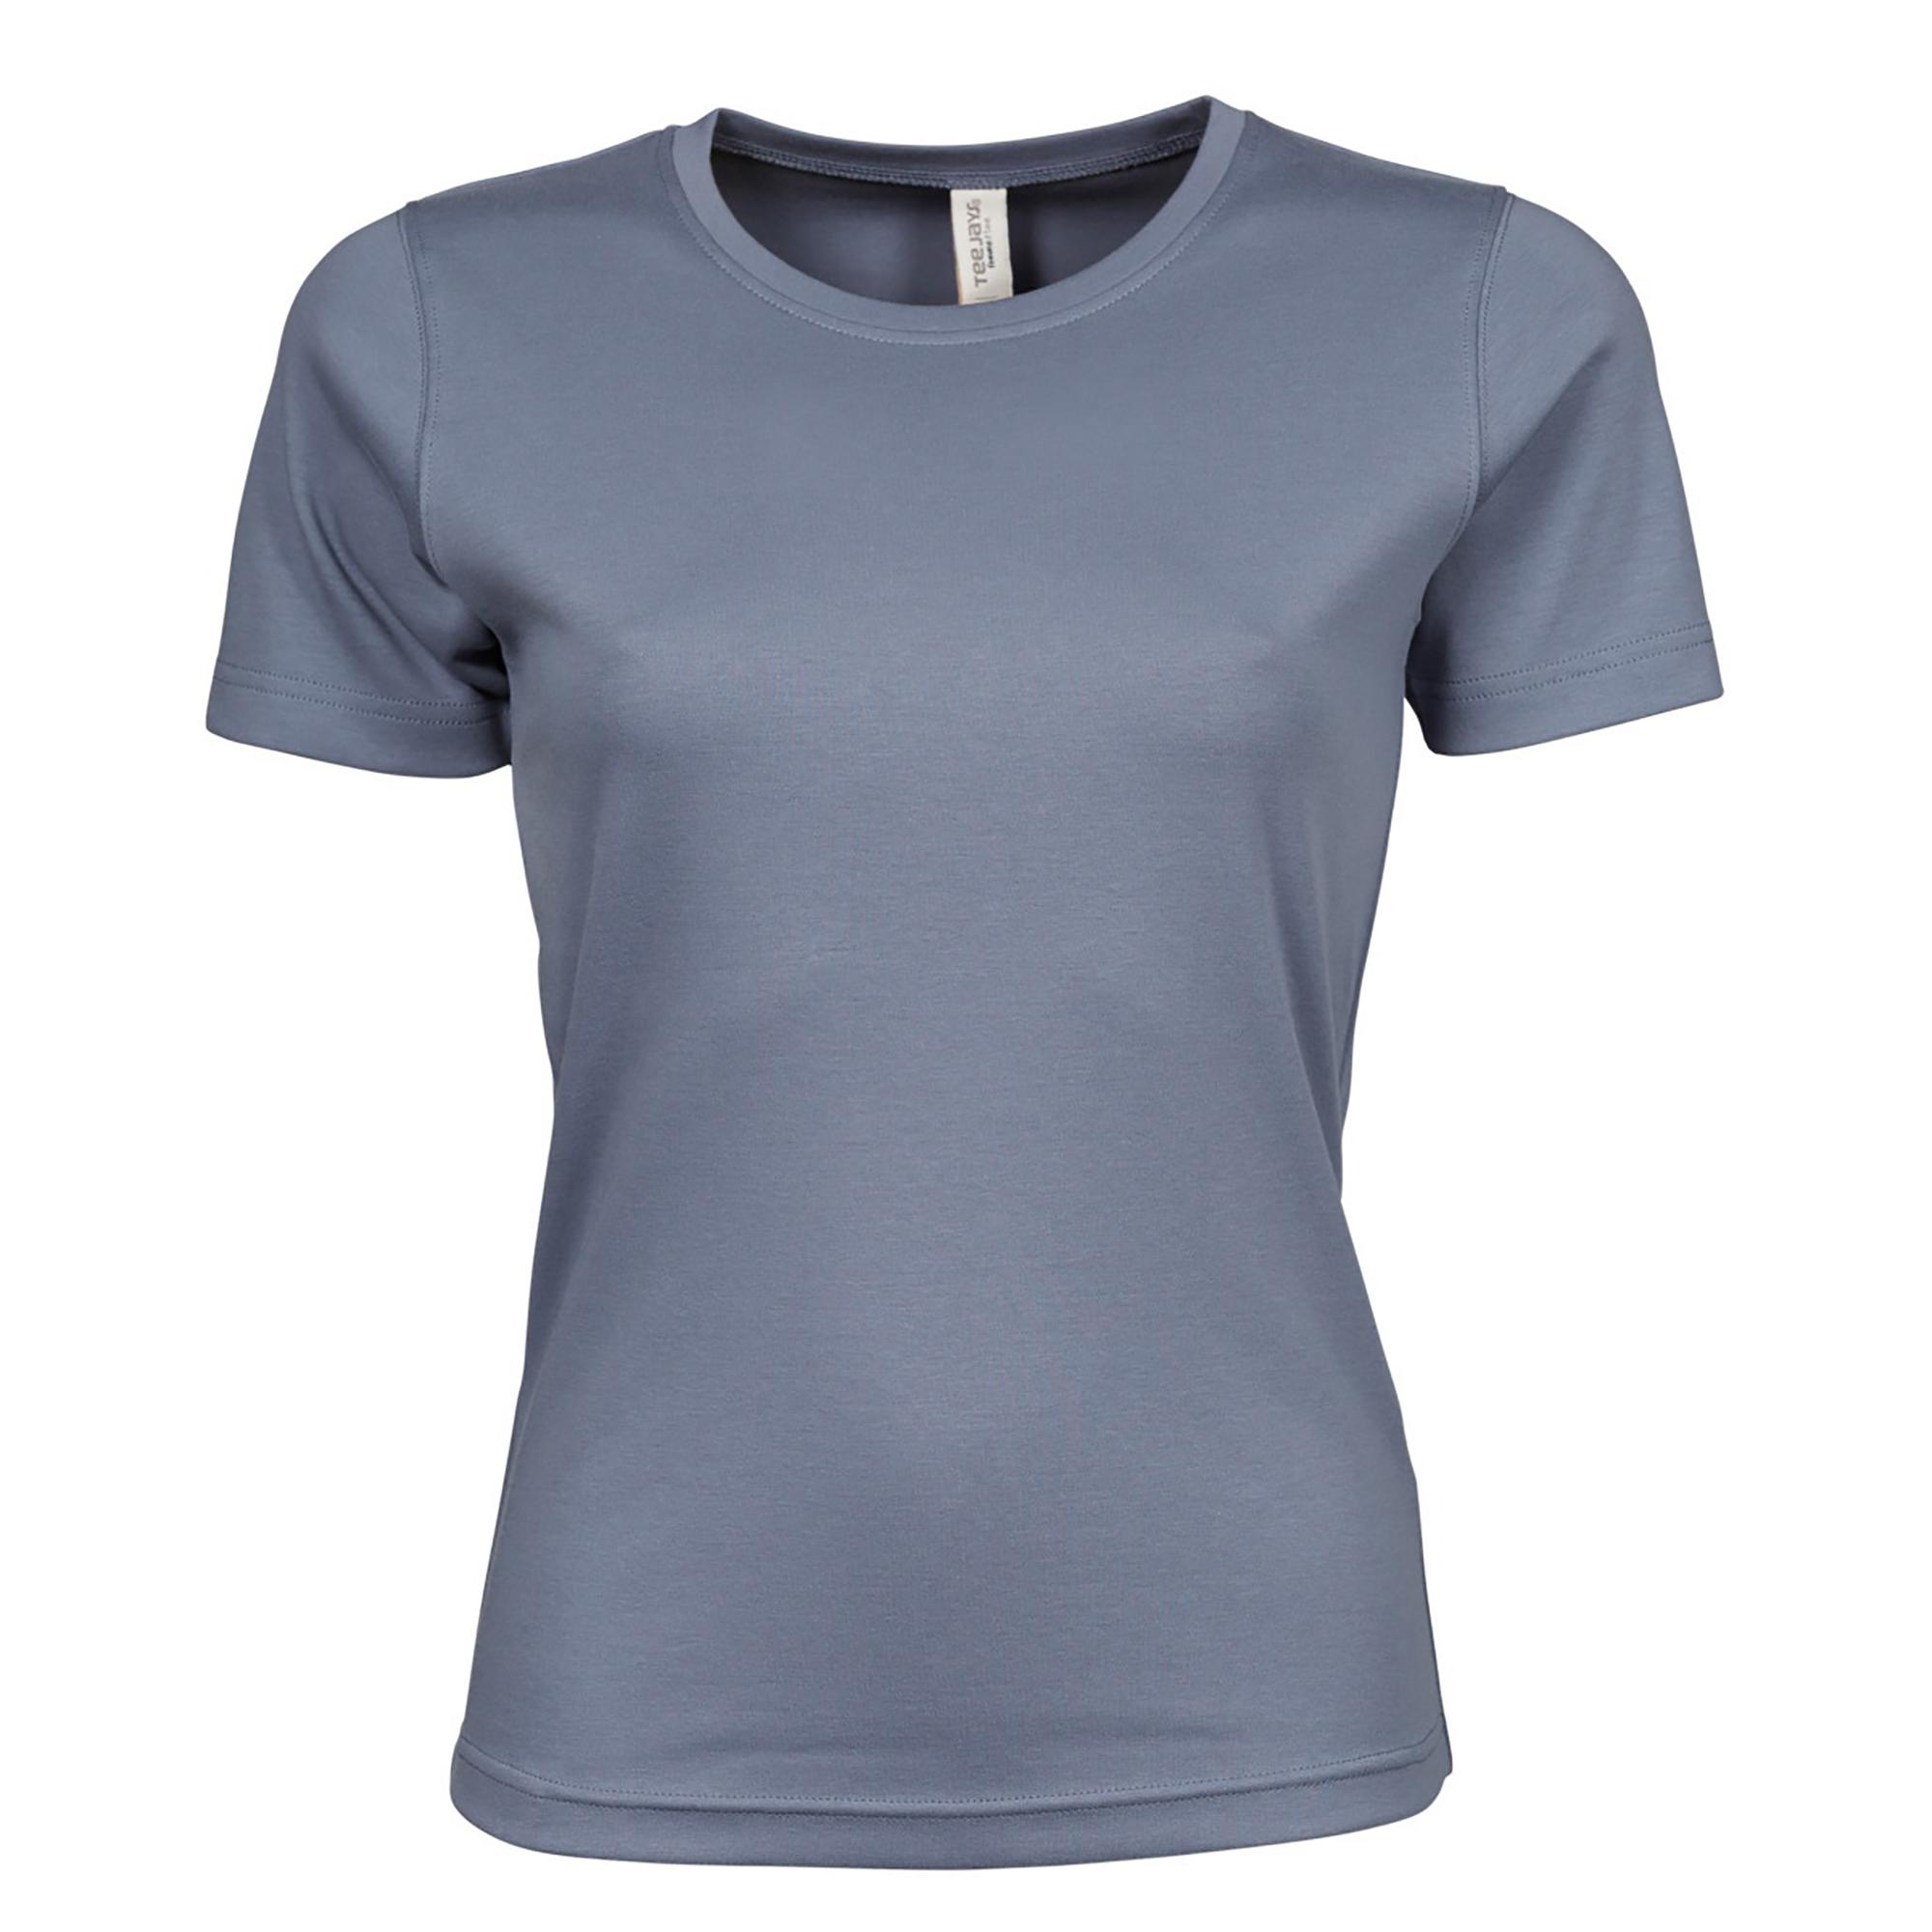 Tee Jays Womens/Ladies Interlock Short Sleeve T-Shirt (S) (Azure Blue)